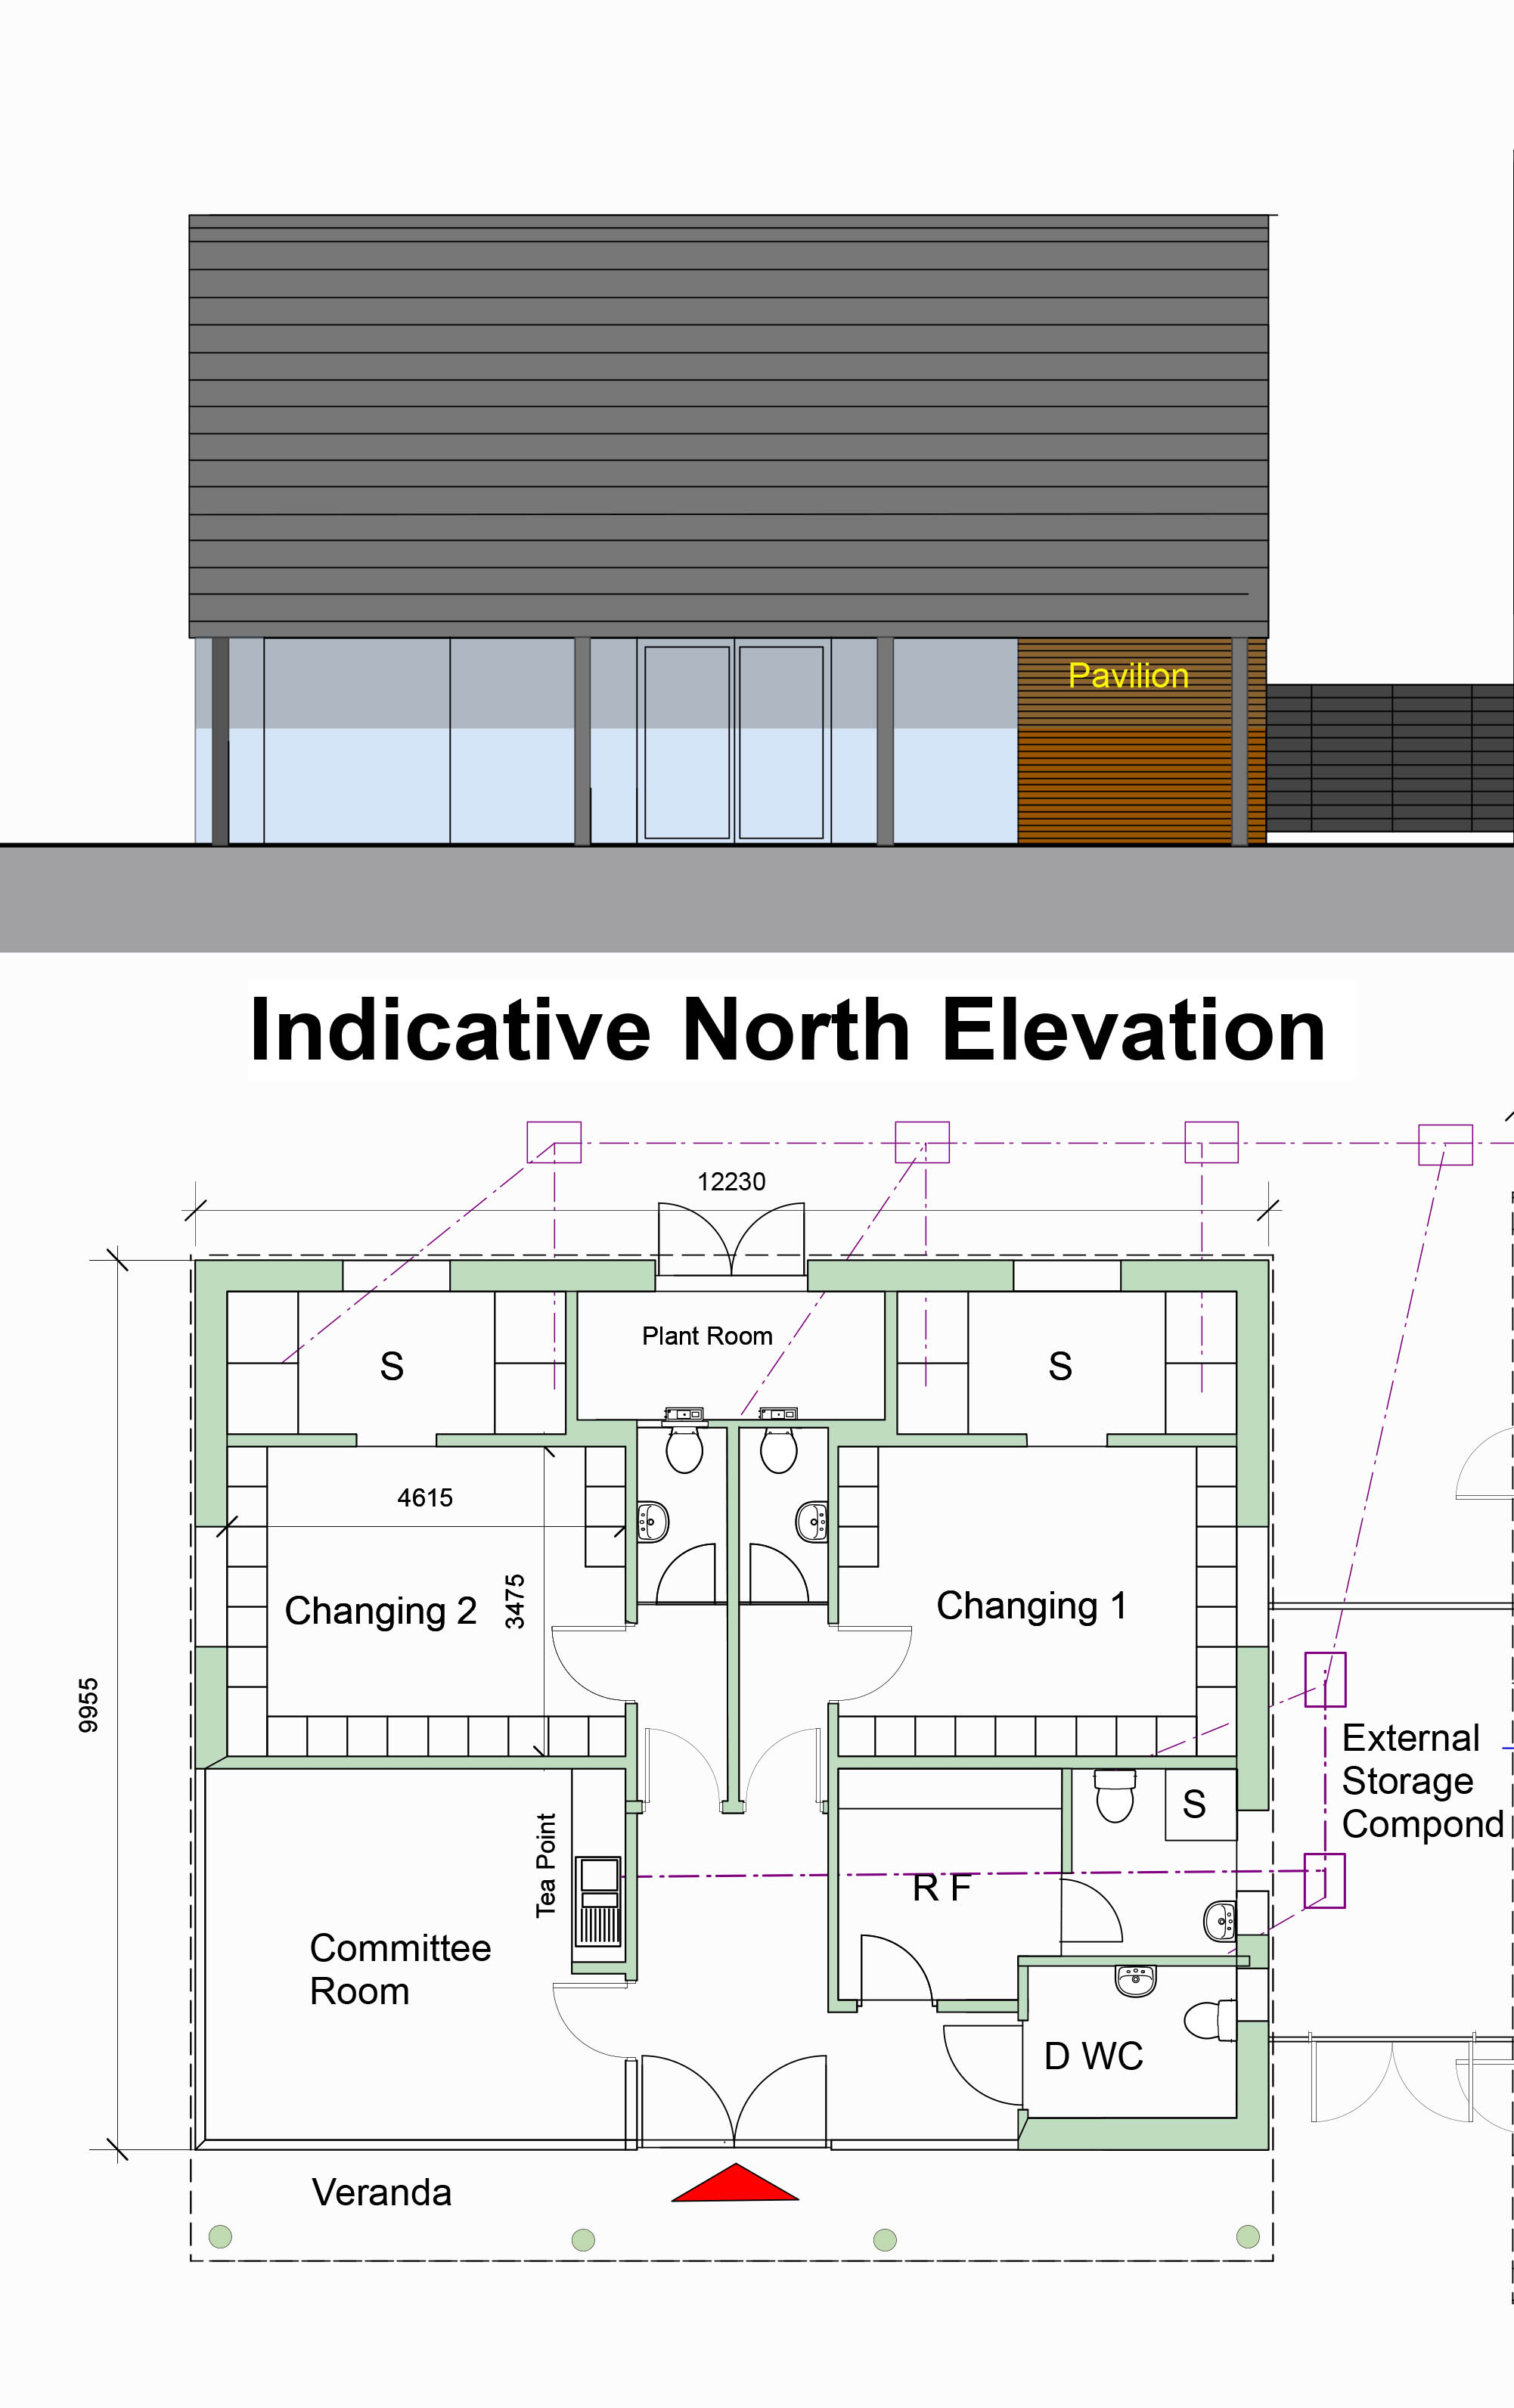 1603060273_pav_elevation_and_floor_plan.jpg